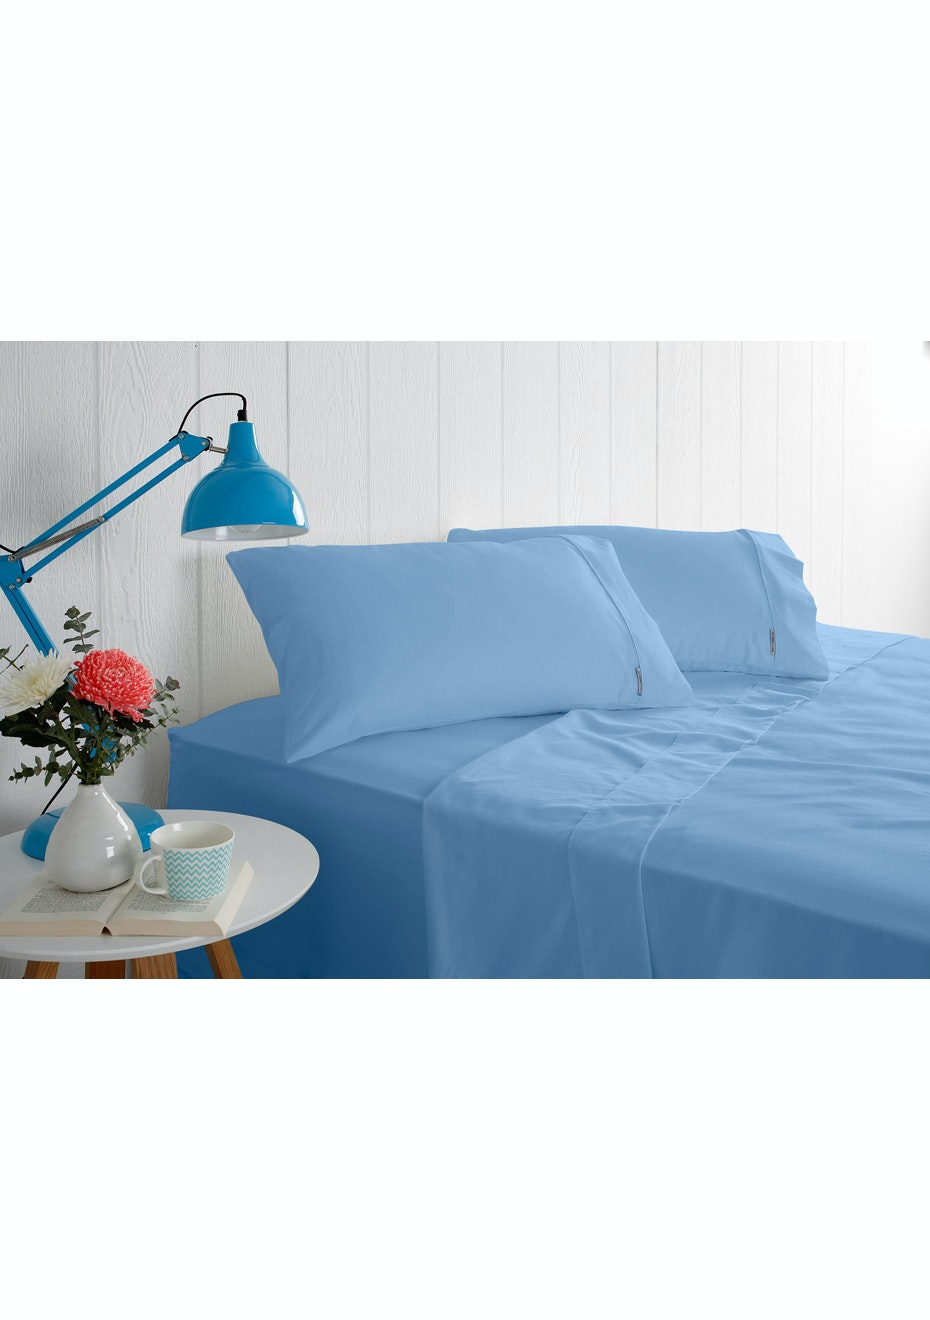 Odyssey Living 1000 Thread Count – Cotton Rich Sheet Sets -Bluebird - King Bed